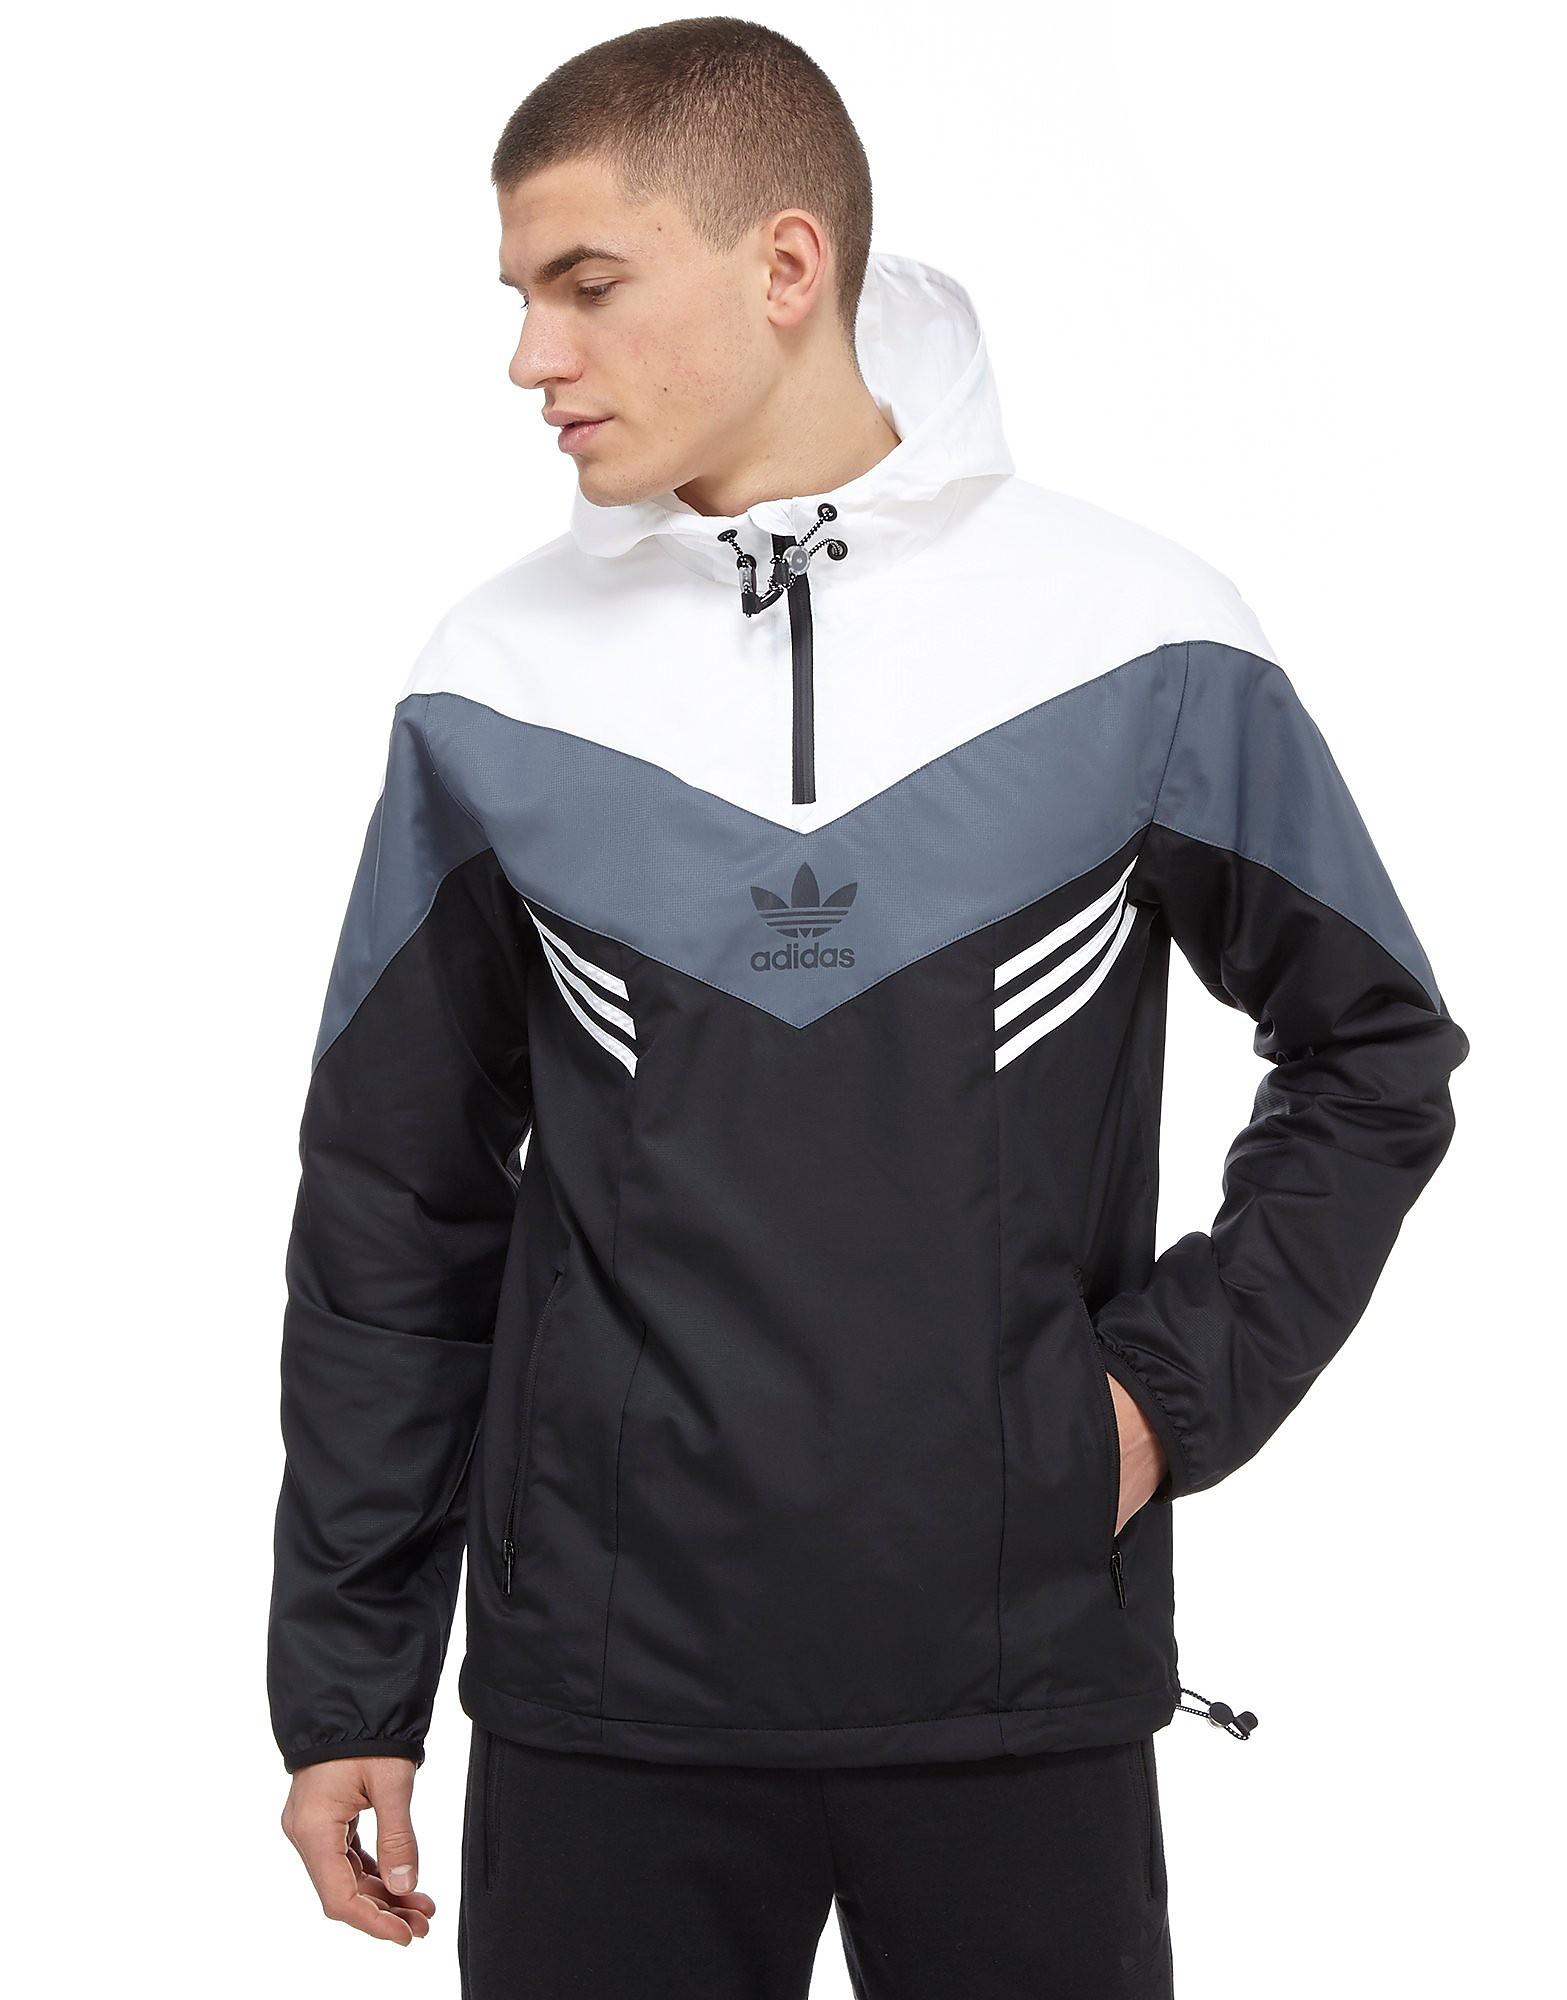 adidas Originals Street Run 1/2 Zip Jacket